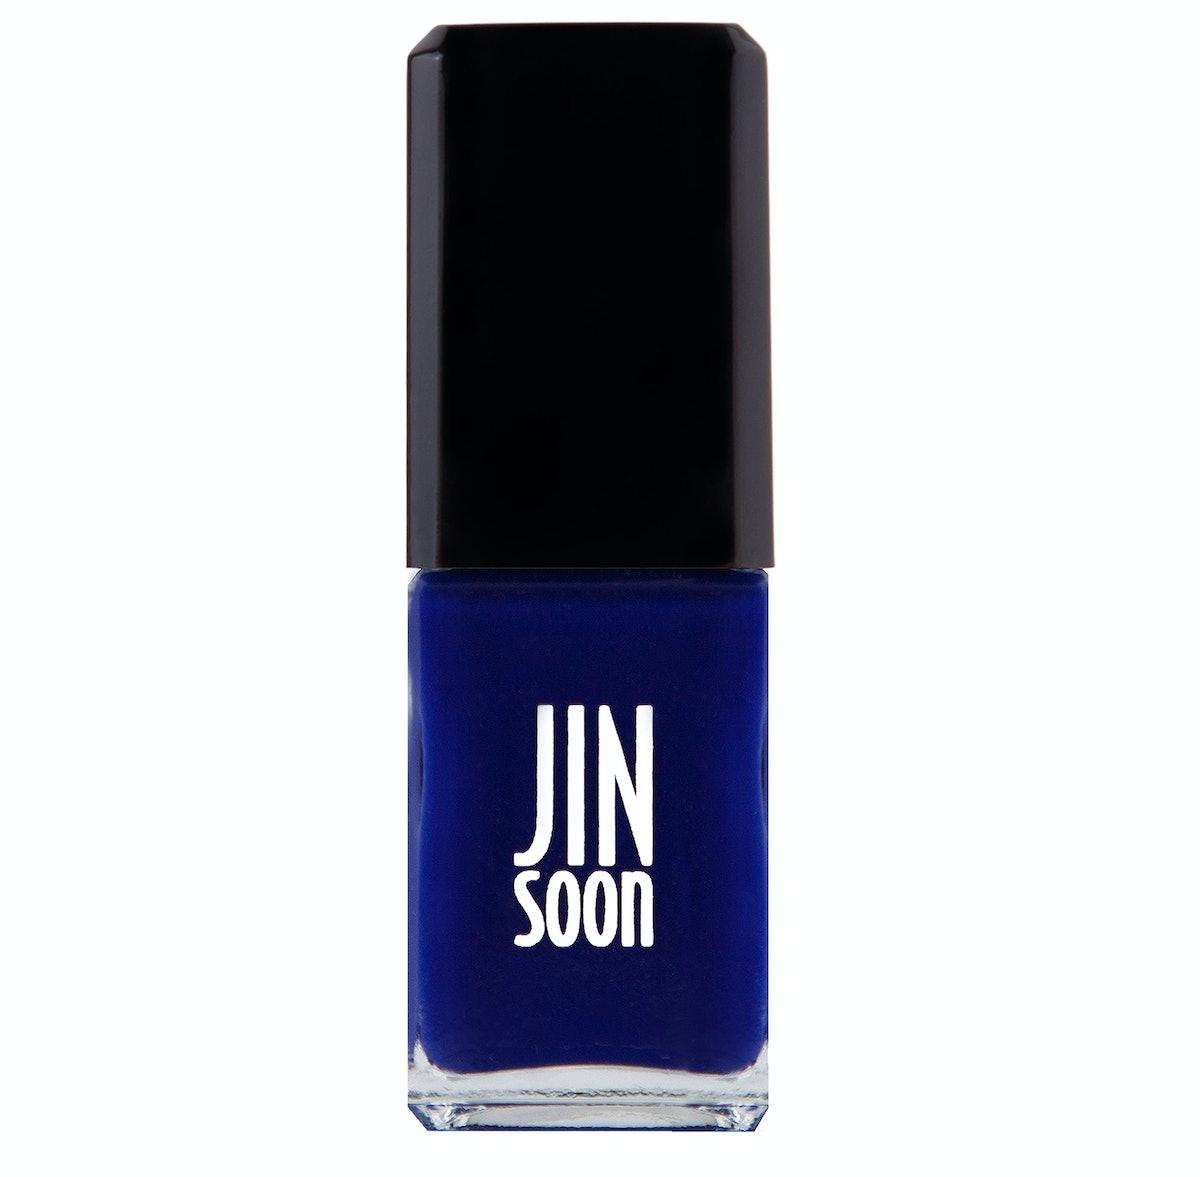 Jin Soon nail polish